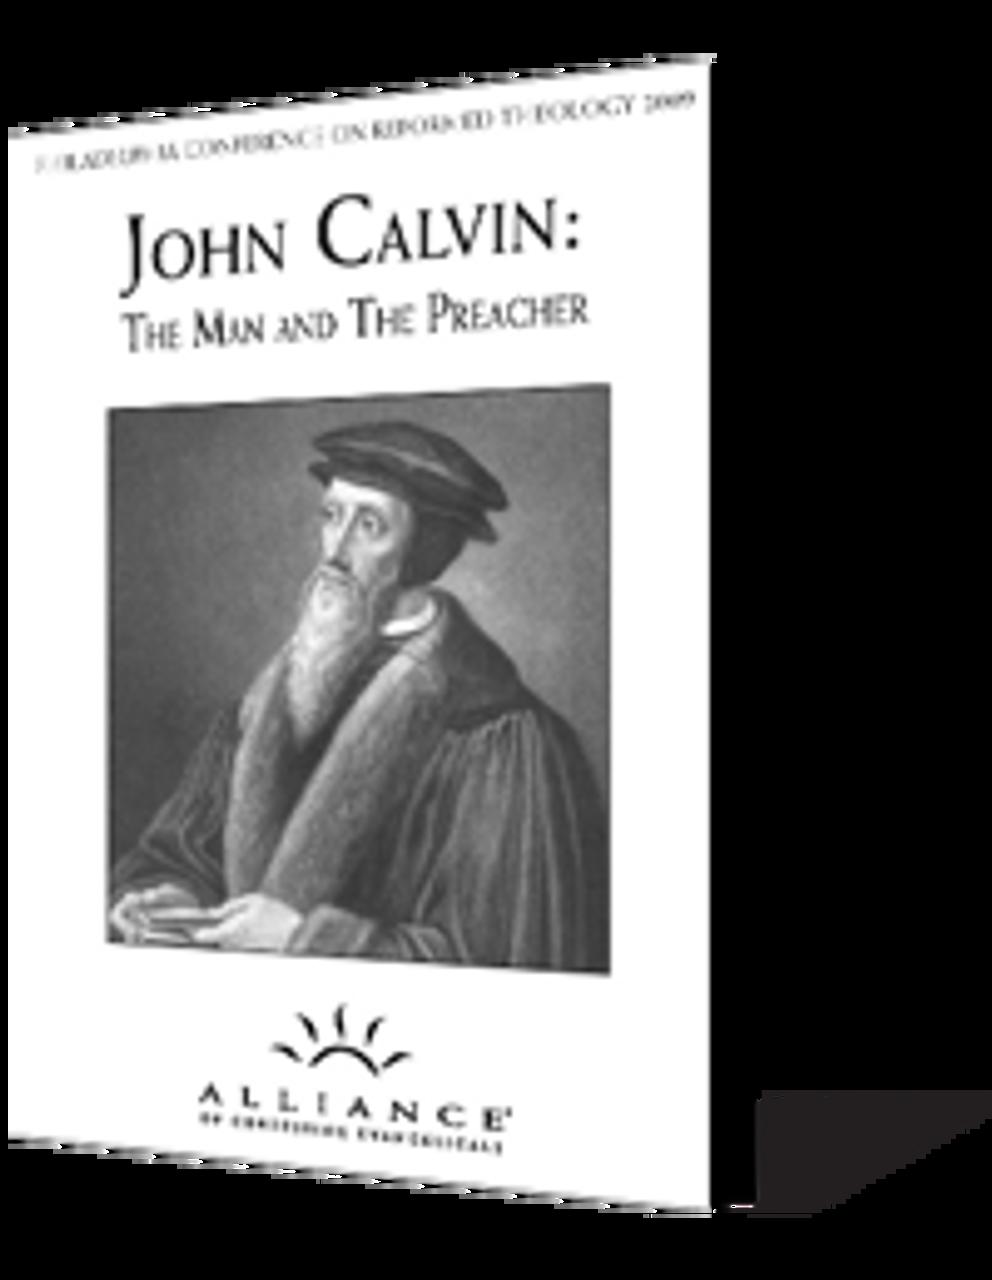 John Calvin: The Man and the Preacher PCRT 2009 Pre-Conference (CD Set)